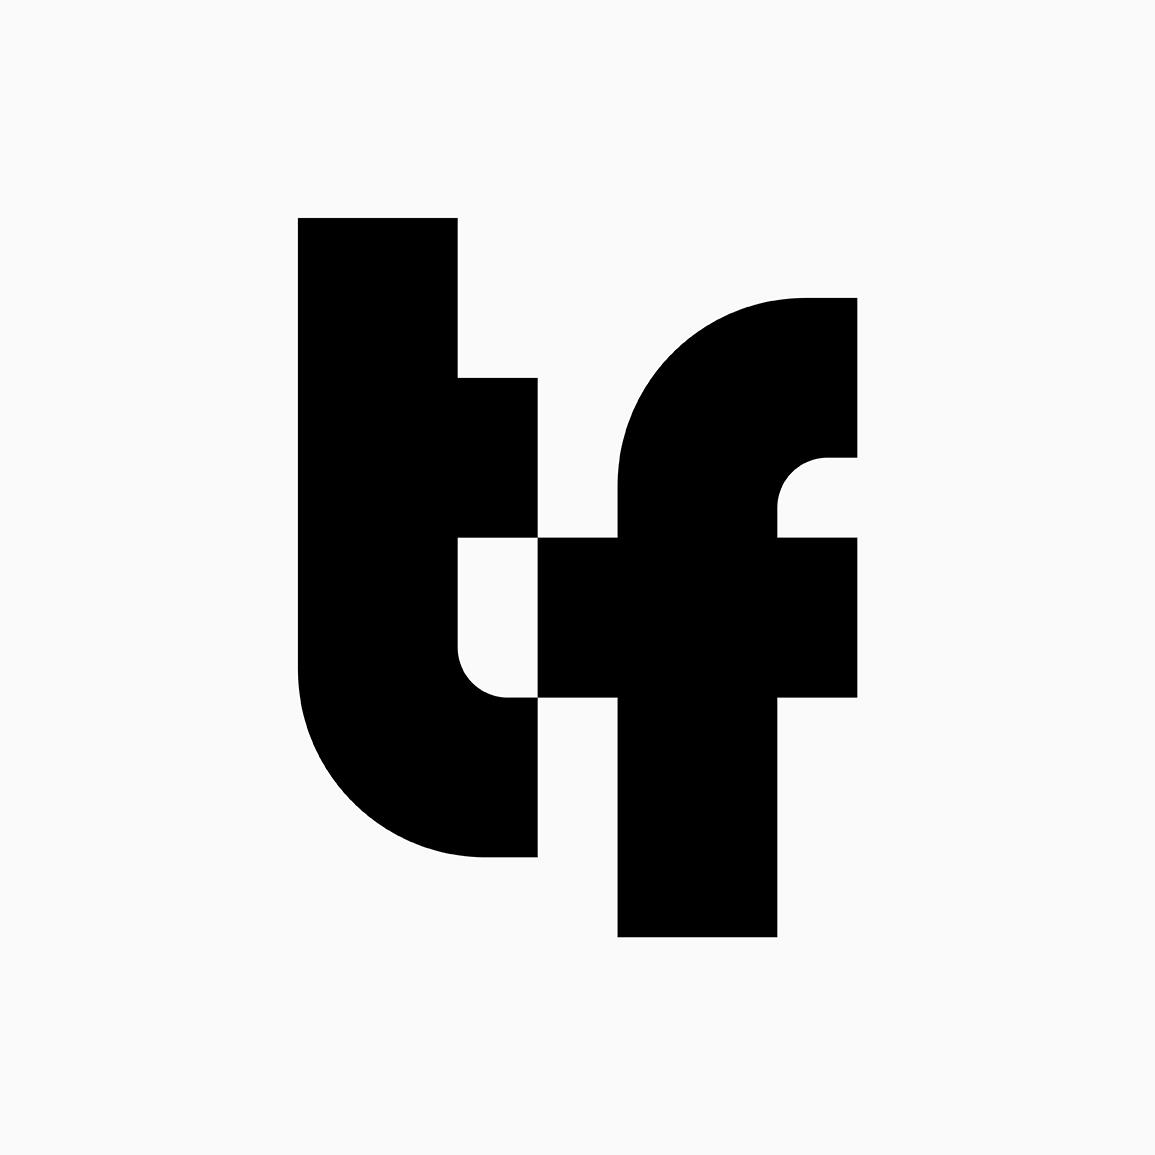 Tofer Flowers on LogoLounge